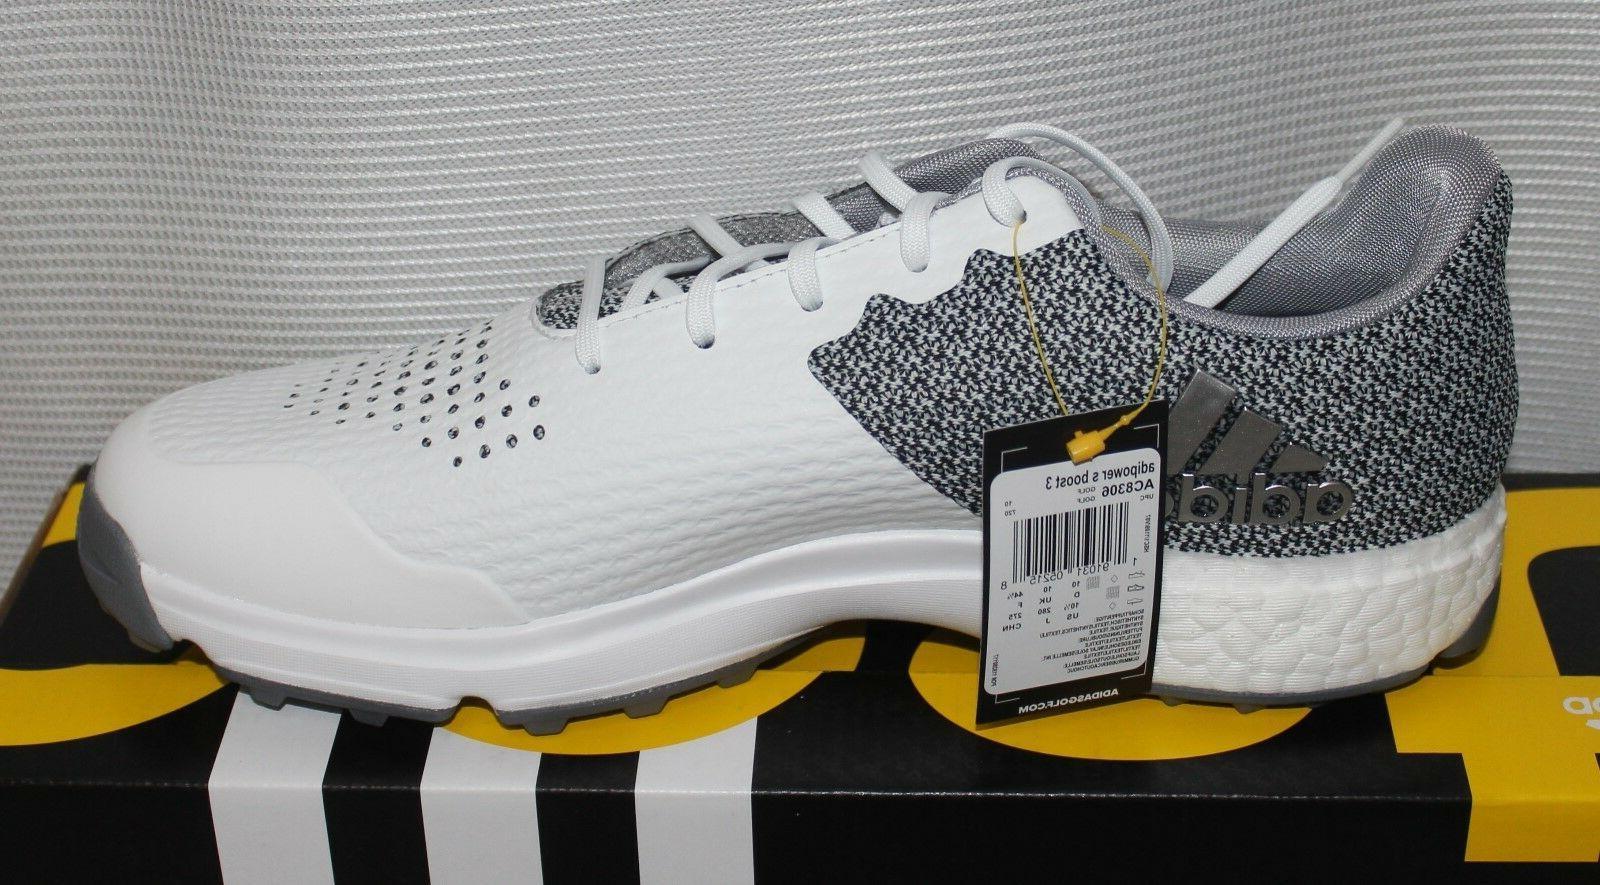 Adidas Boost 3 - Metallic